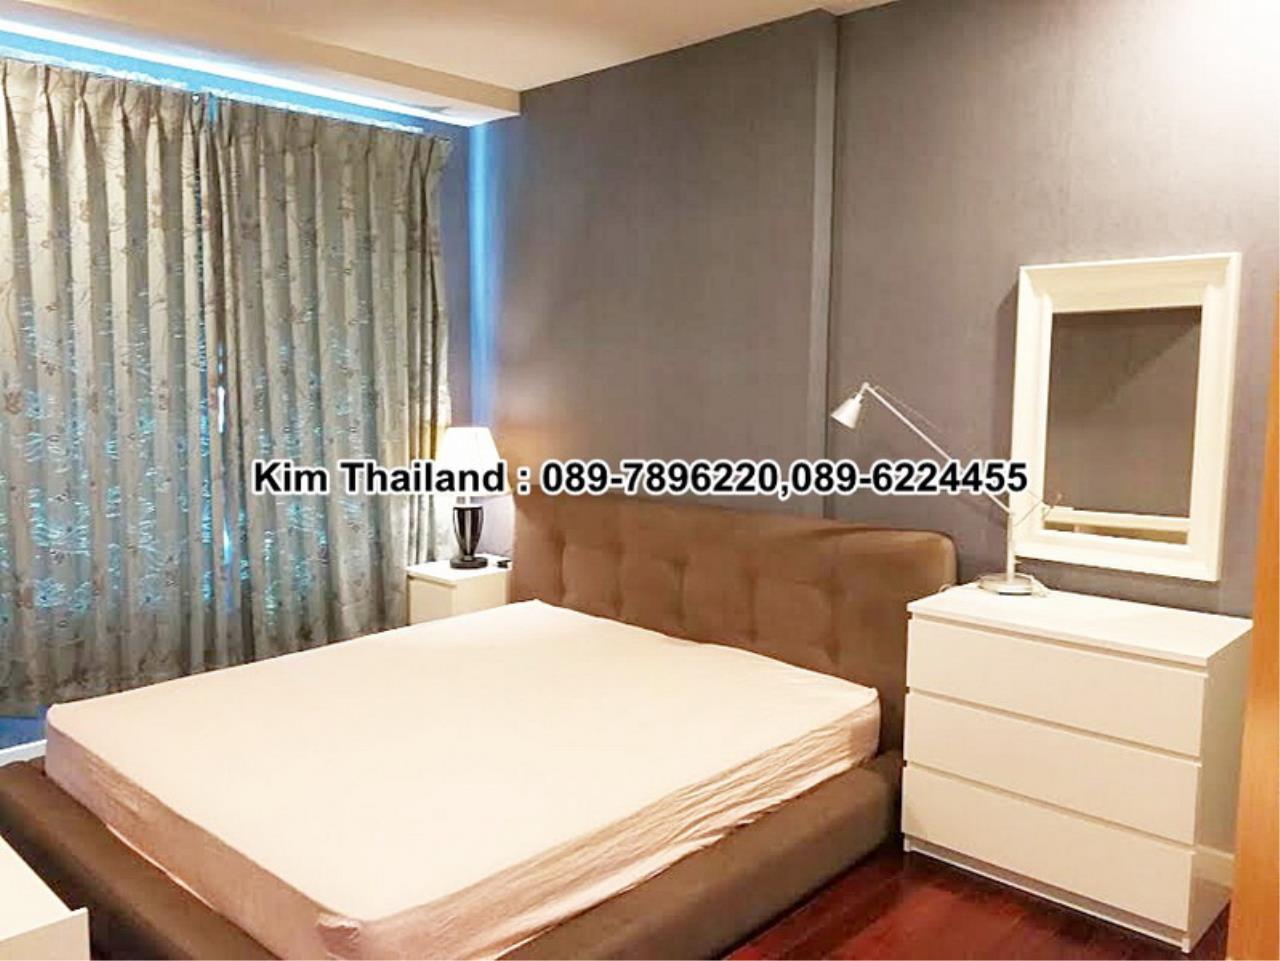 BKKcondorental Agency's For rent, Circle Condominium.  Area 76 sq.m. 2 bedrooms. Rental 35000THB/month. 1